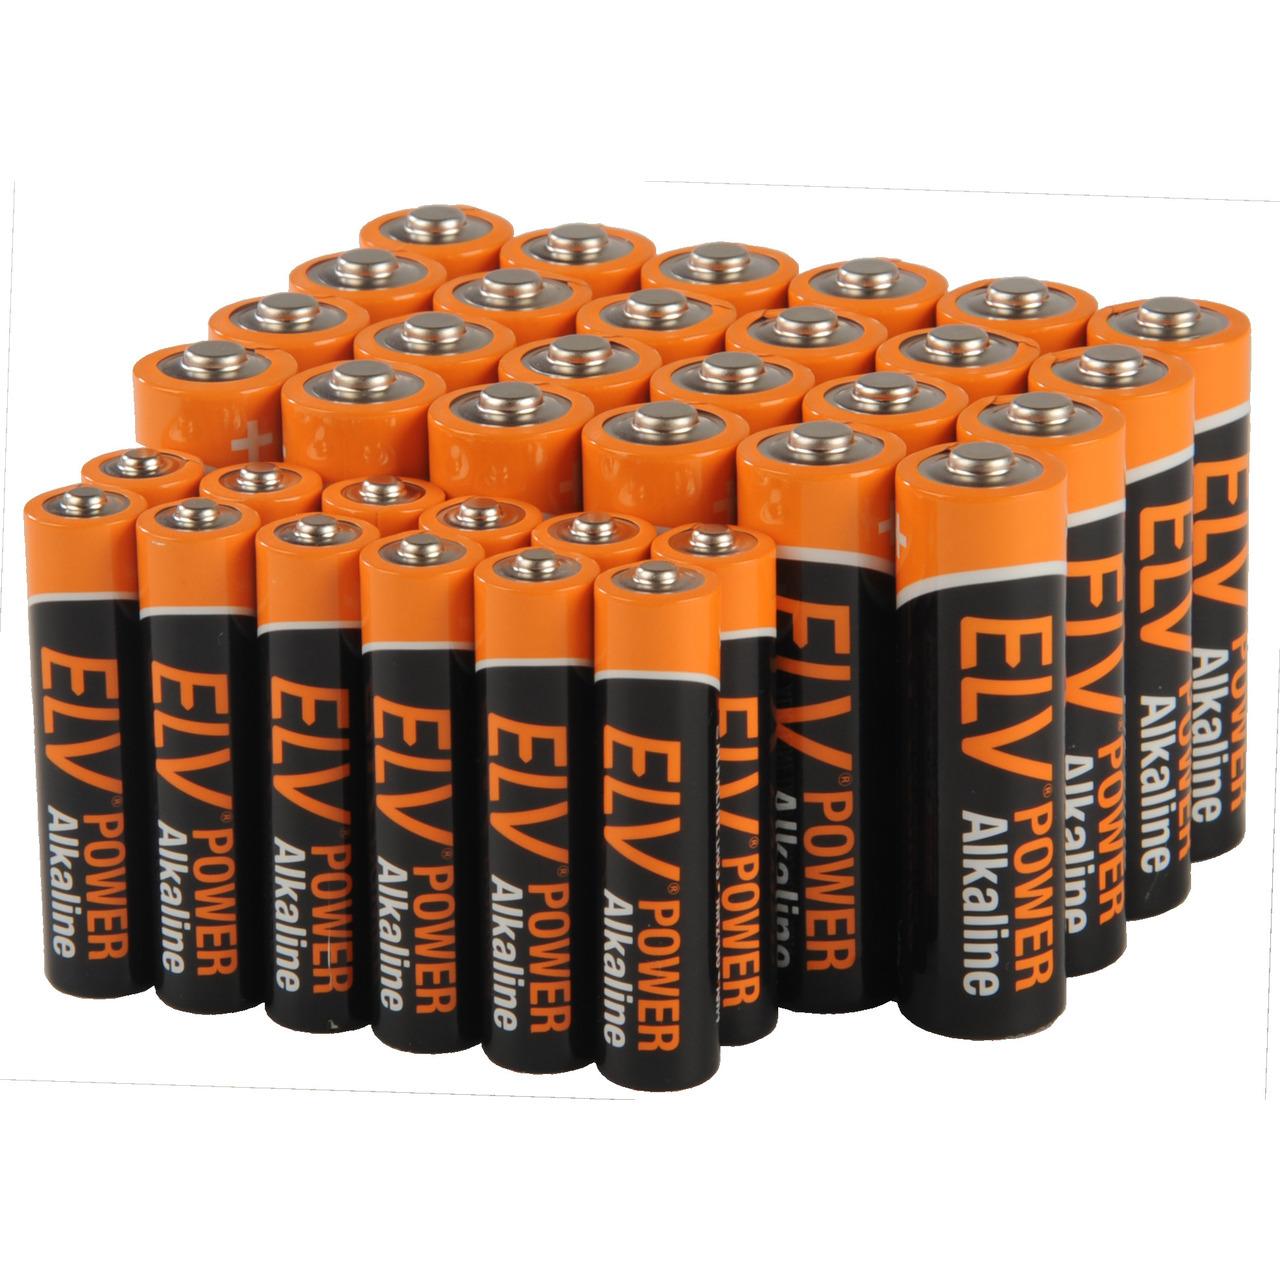 ELV POWER Alkaline Vorratspack-  12x Micro AAA und 24x Mignon AA